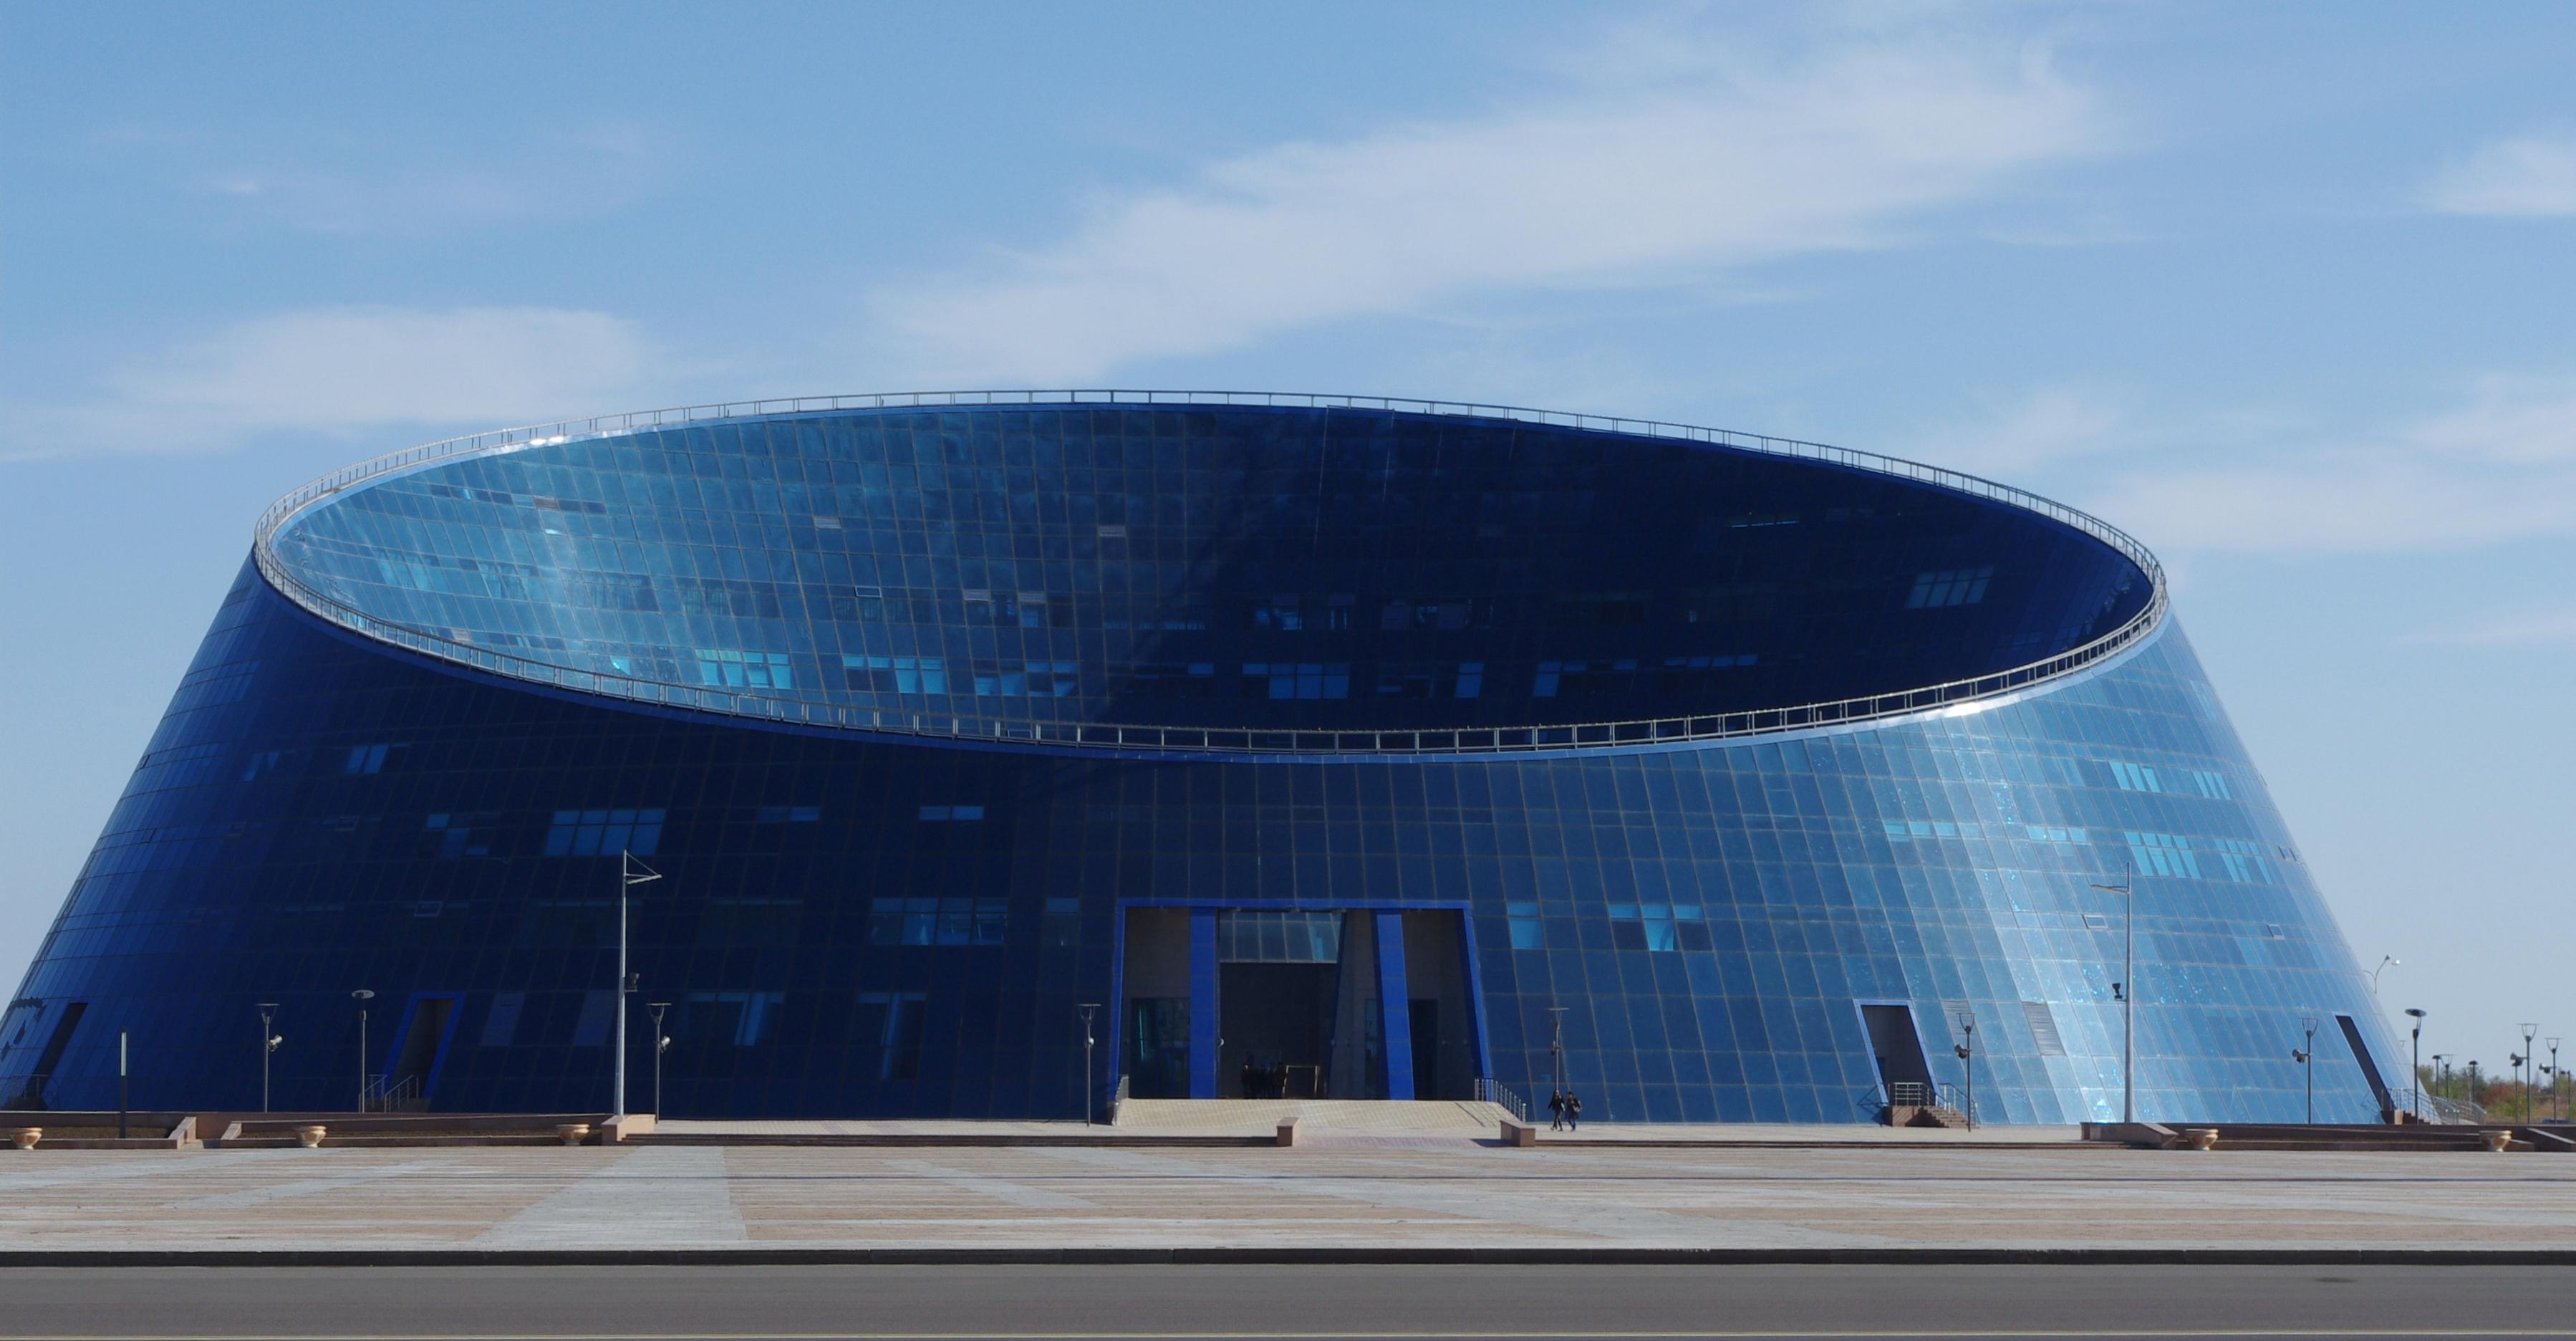 Kazajistán, kazajistan, kazajstan, astaná, astana, capital, norman foster, futurista, arquitectura onirica, urbanismo